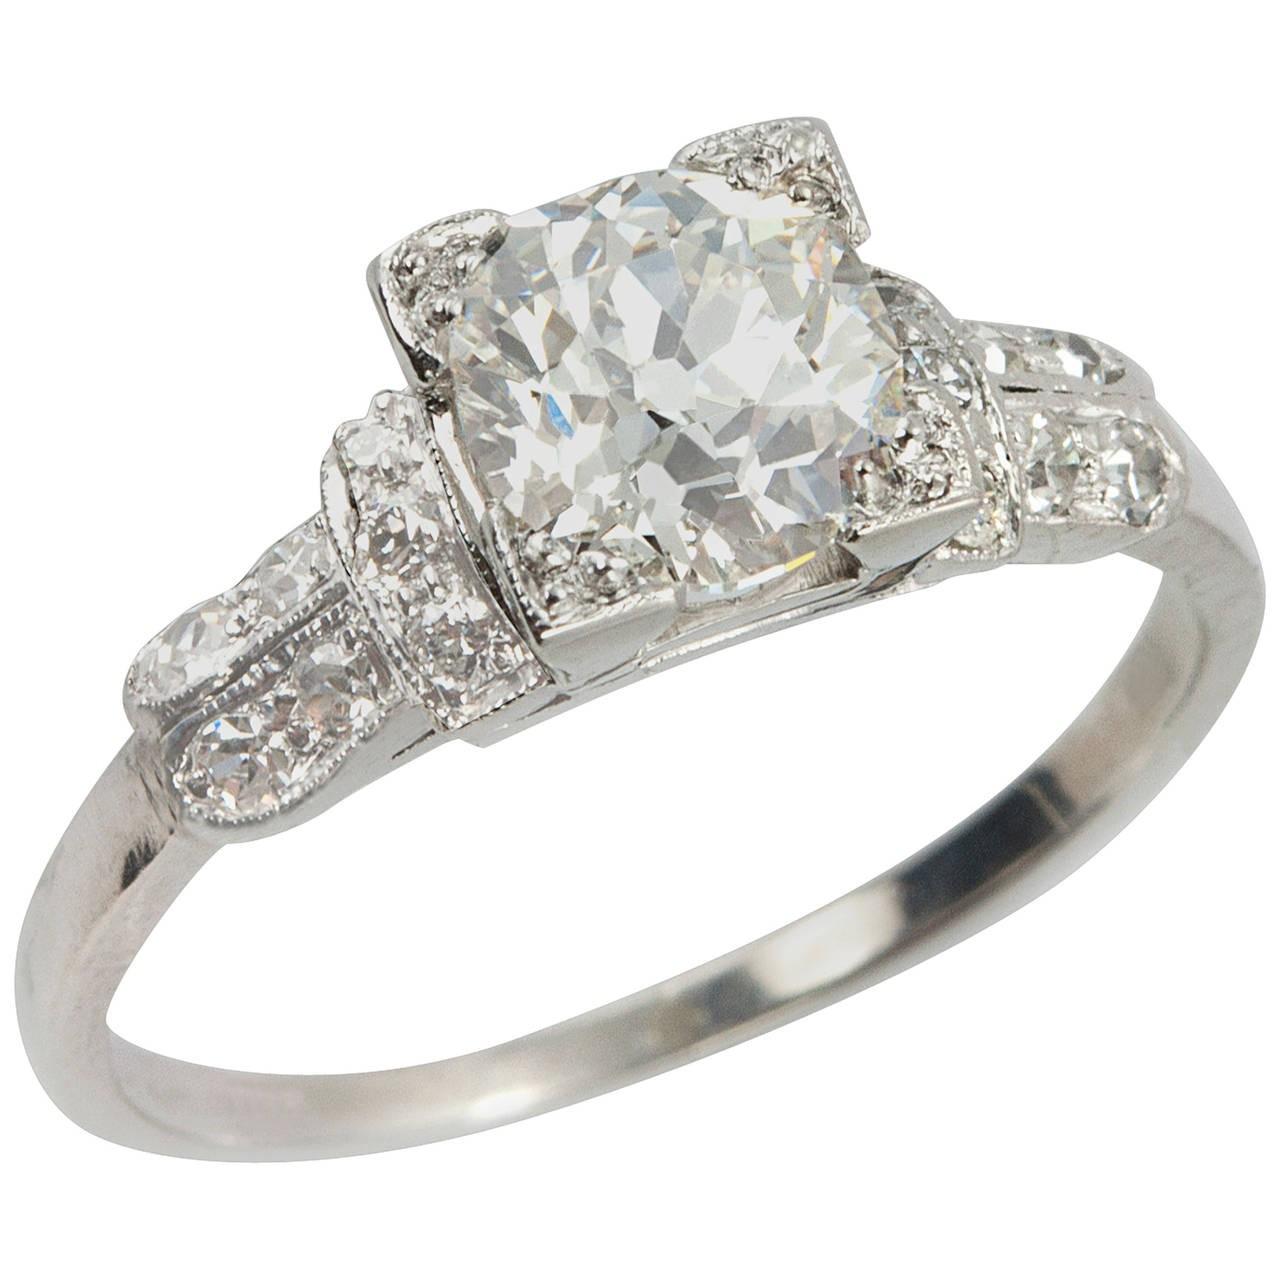 1.01 Carat Cushion Cut Diamond Art Deco Engagement Ring